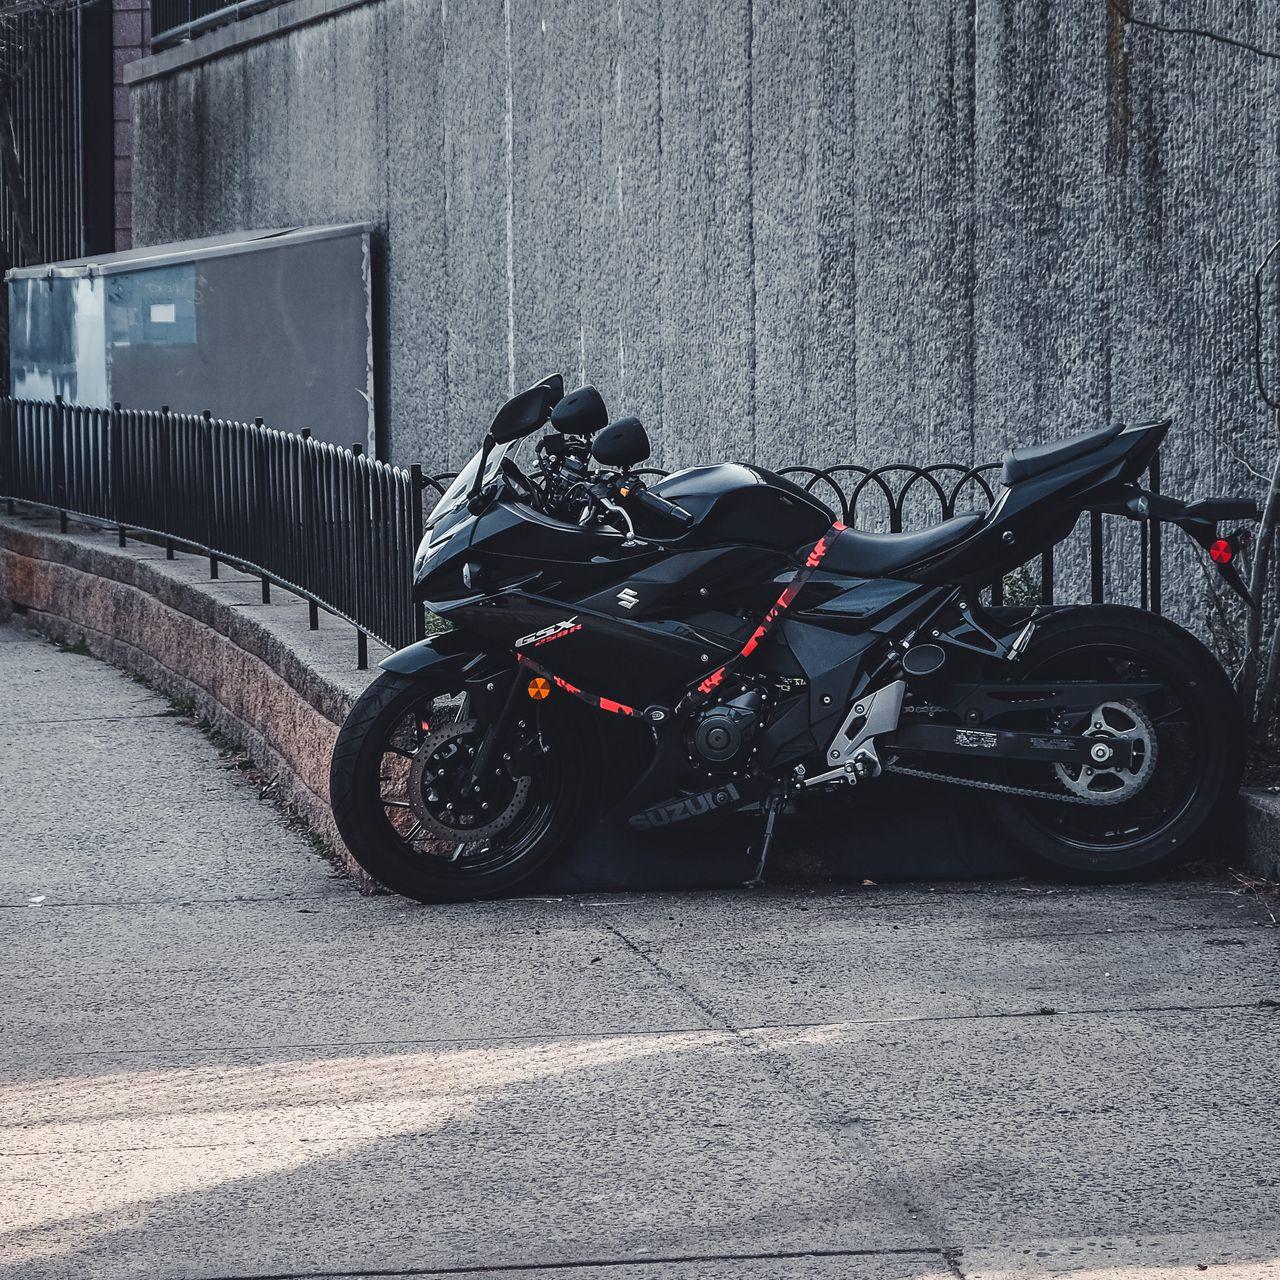 1280x1280 Wallpaper suzuki, motorcycle, bike, black, parking